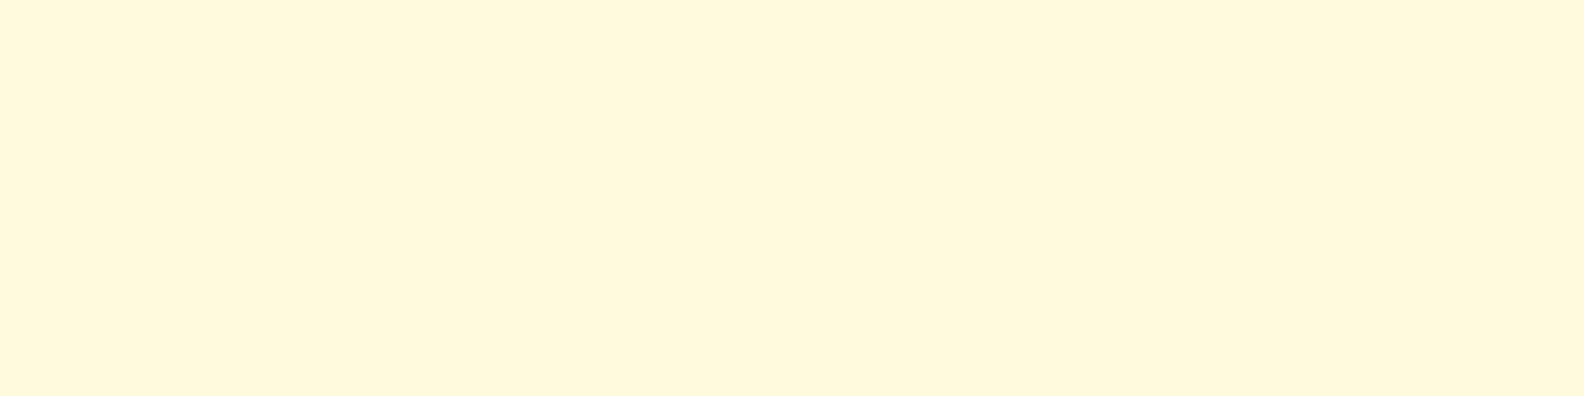 1584x396 Cornsilk Solid Color Background